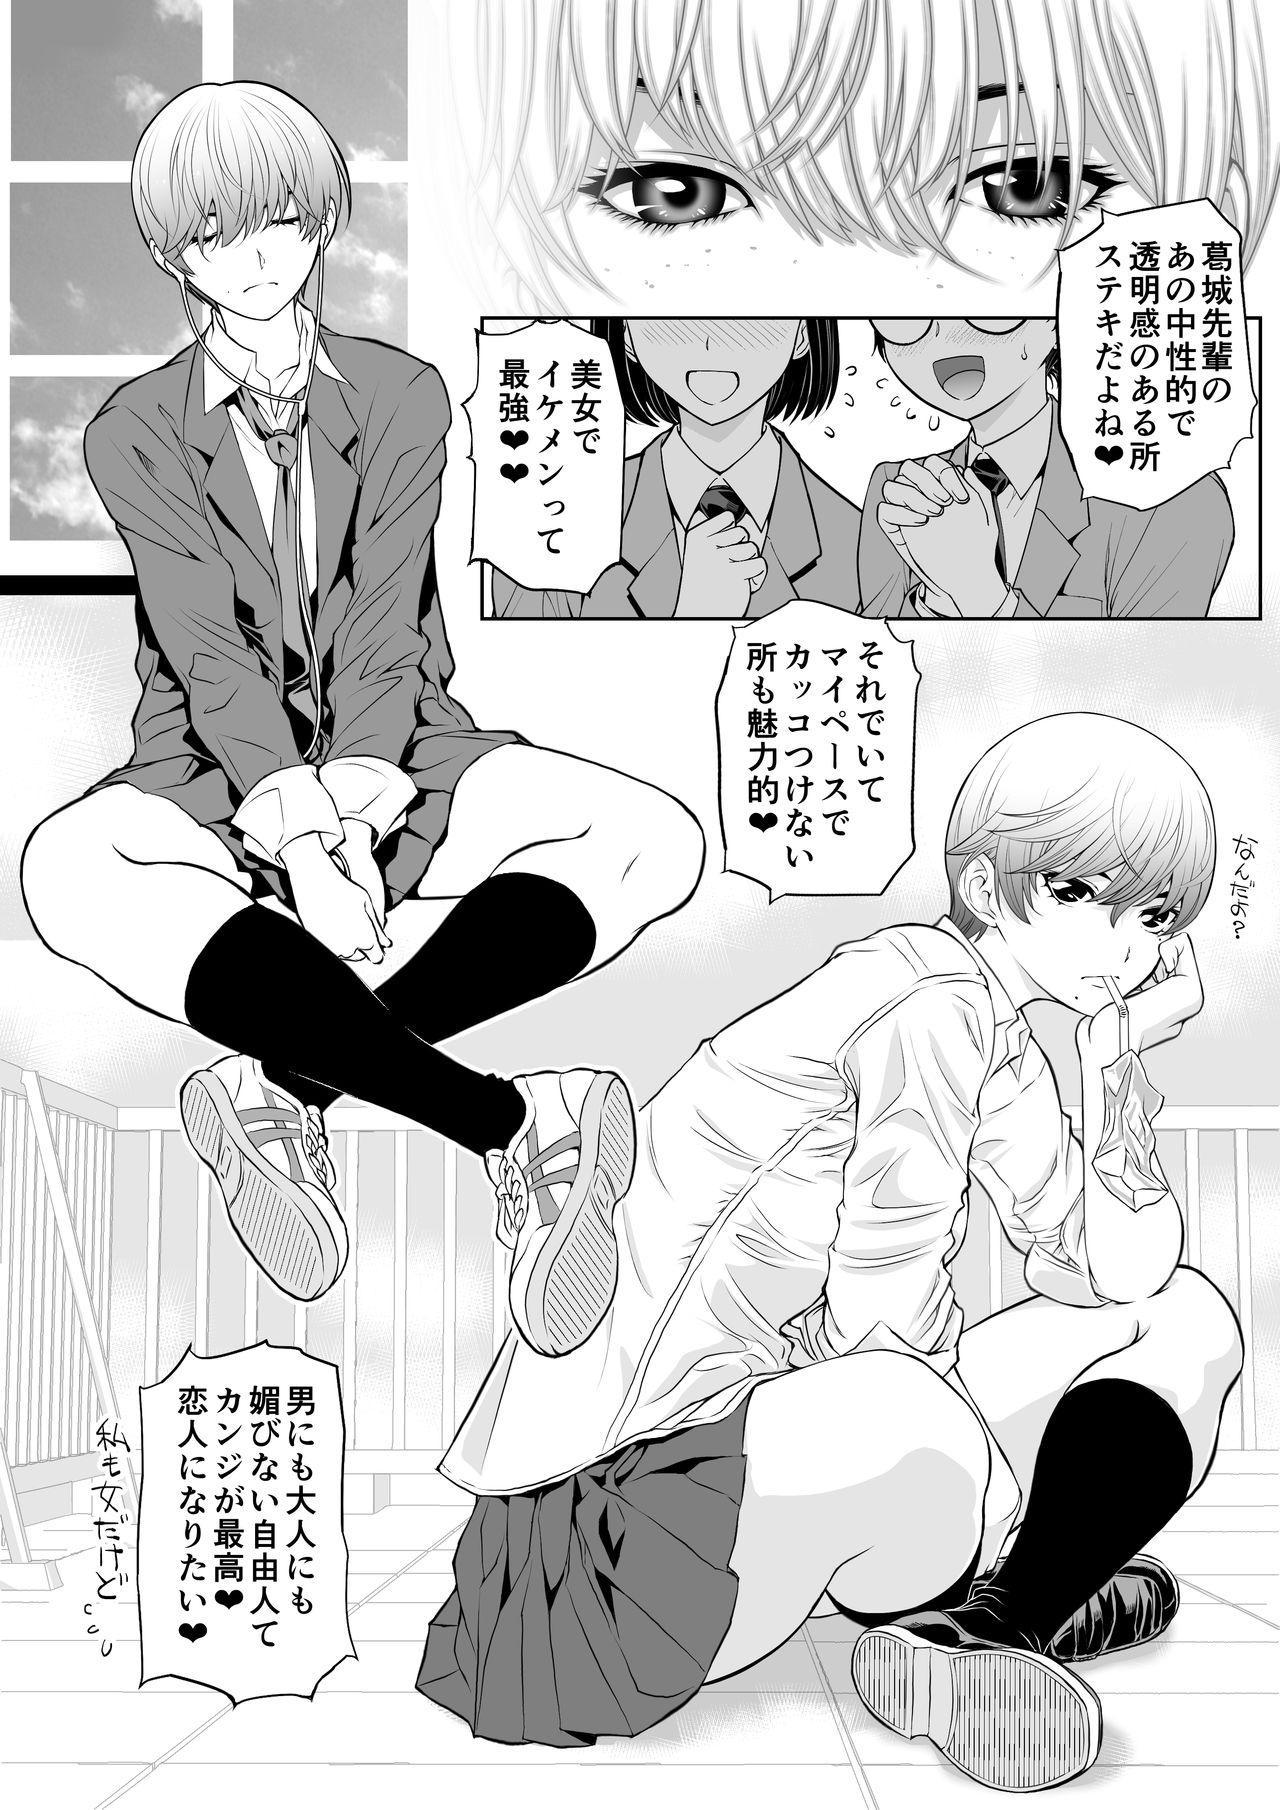 Namaiki mmusume ni tsuyo ● ikīki jugyō 2